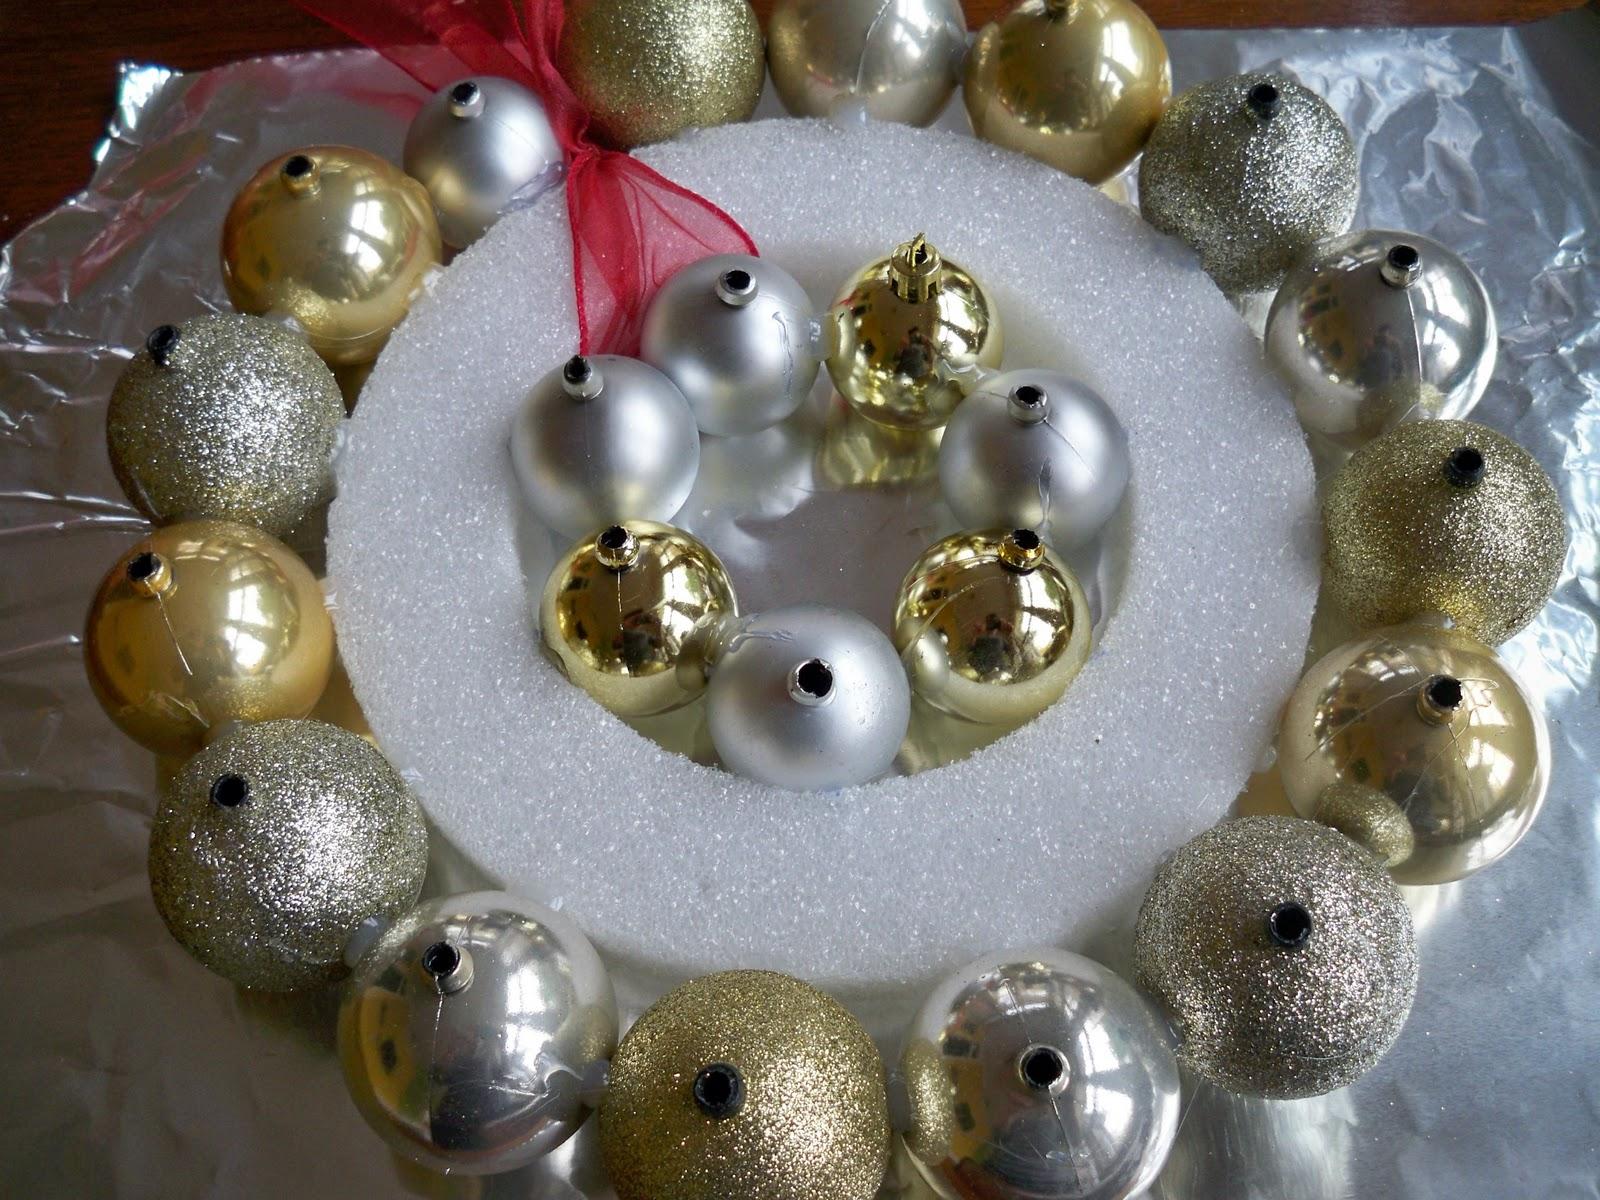 Ball+ornament+wreath